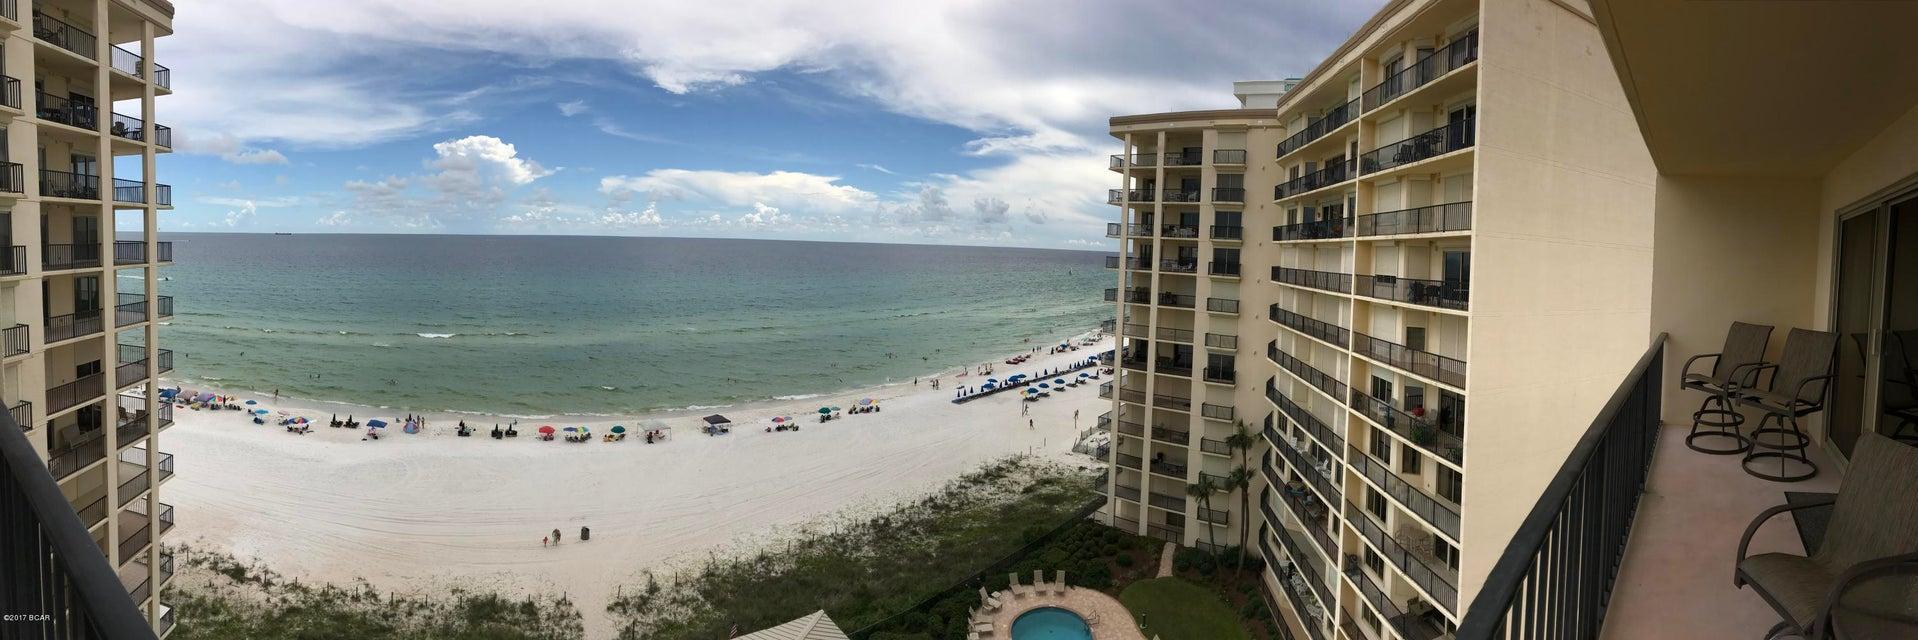 6323 THOMAS DR 903A, Panama City Beach, FL 32408